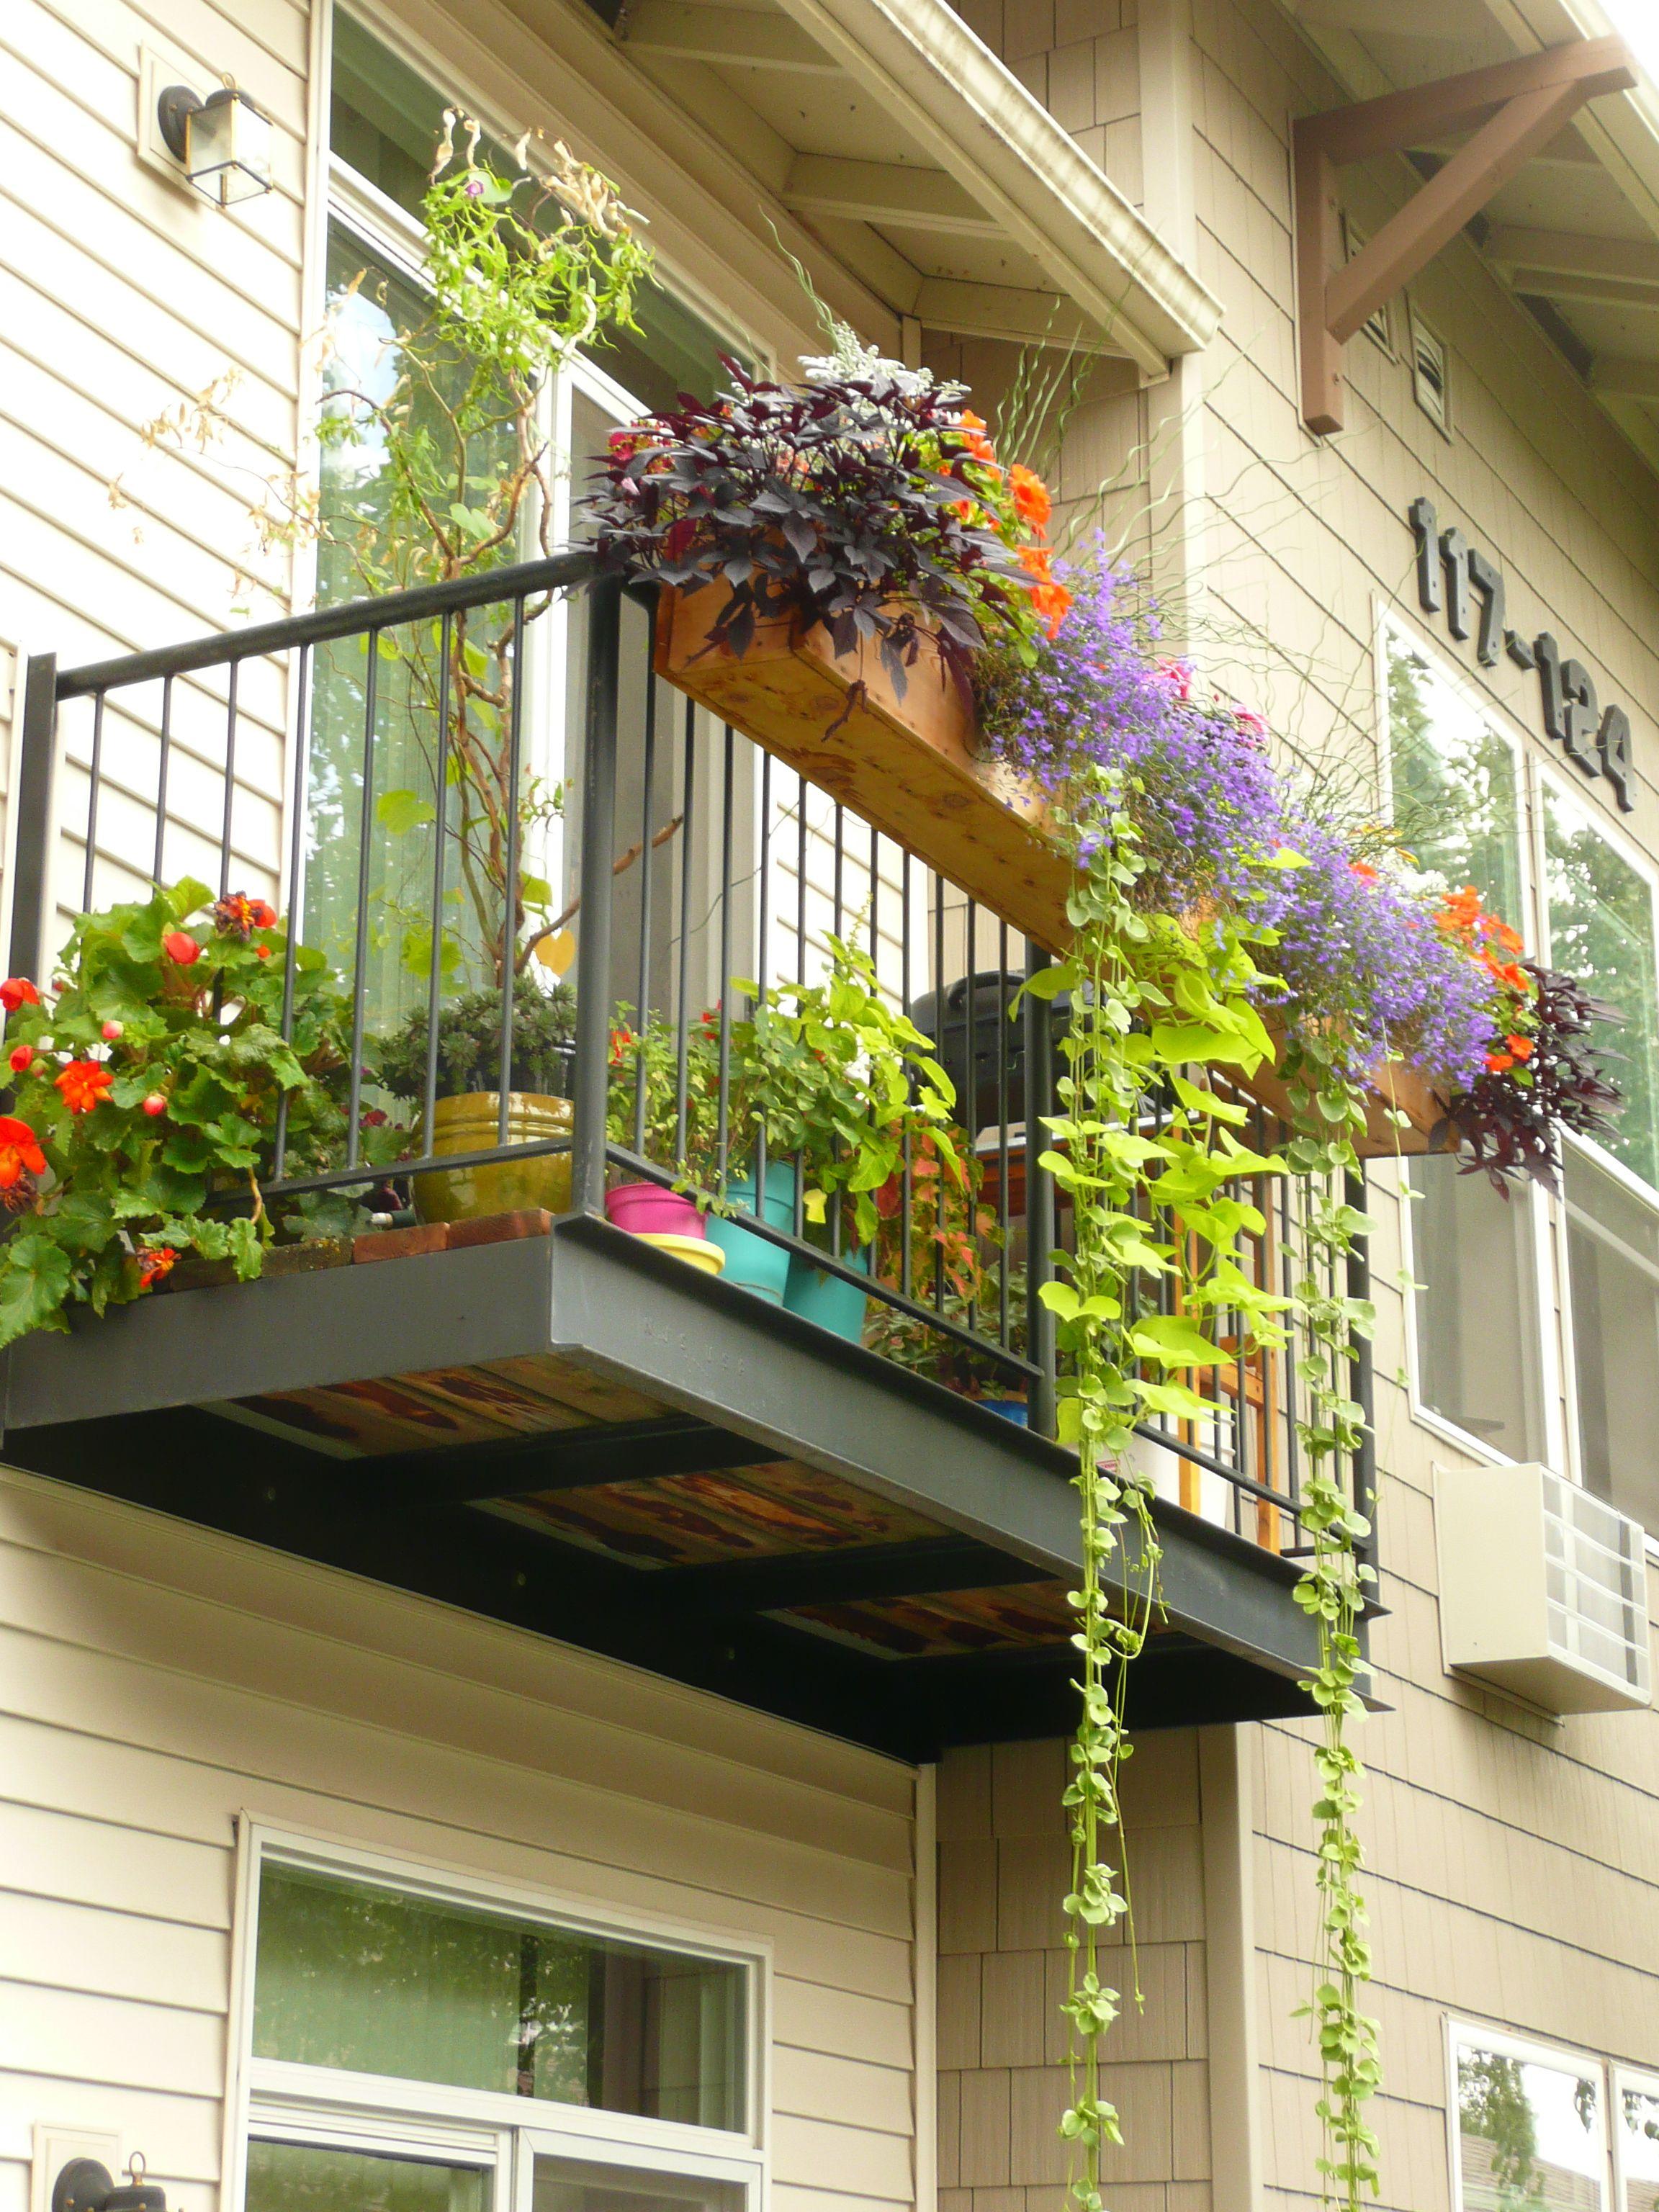 Our Apartment Patio Deck Last Summer Diy 7 Cedar Planter In Part Shade